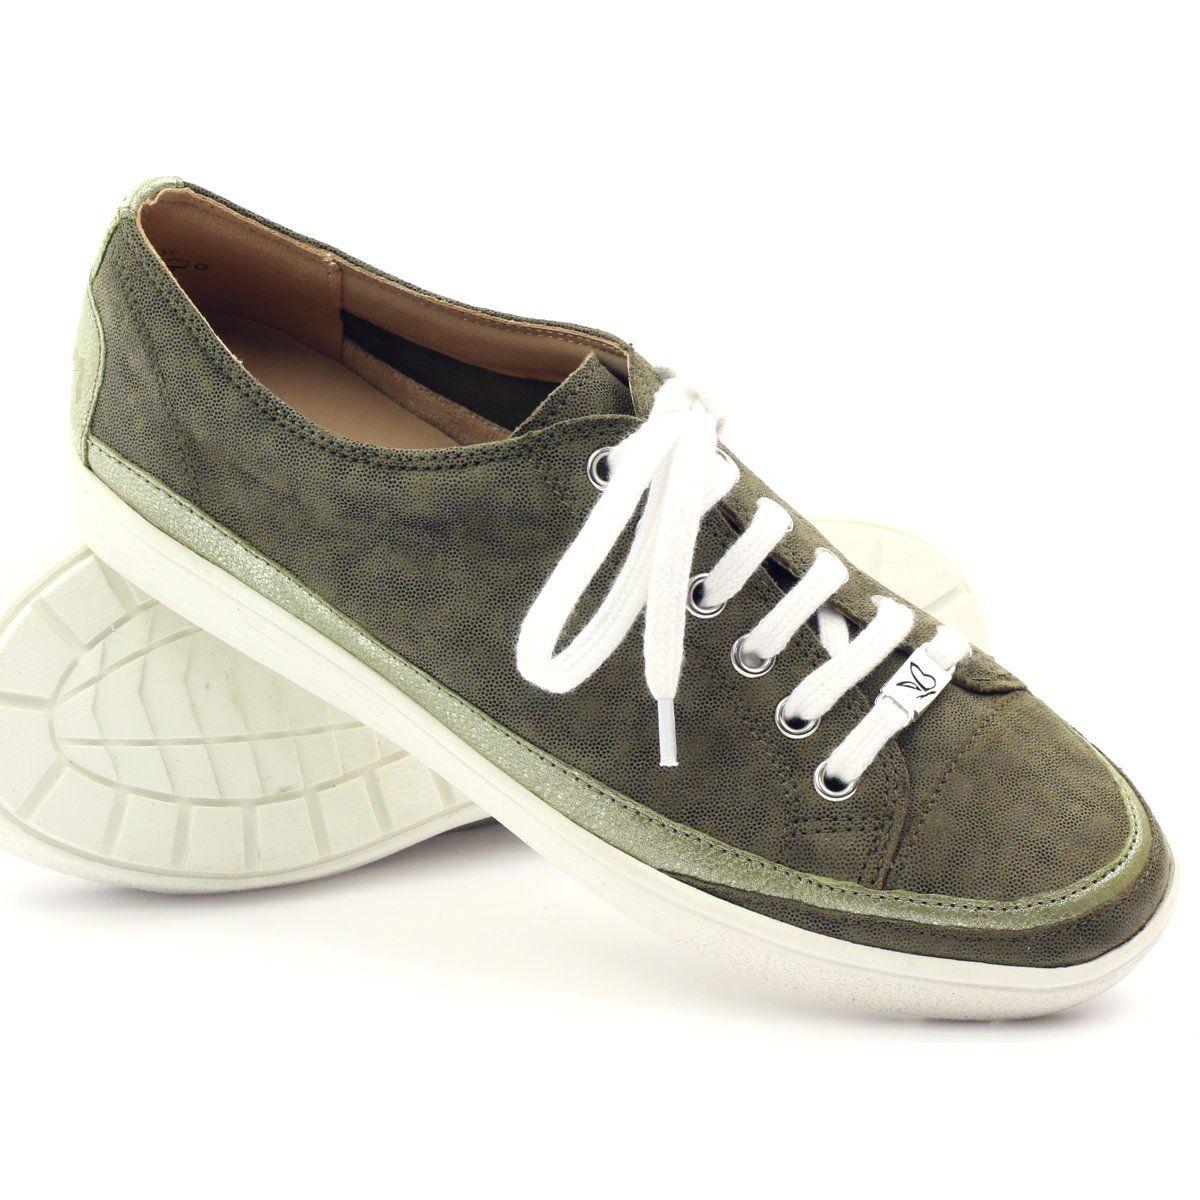 Caprice Buty Damskie Trampki Skorzane 23654 Zielone Zolte Sneakers Vans Authentic Sneaker Shoes